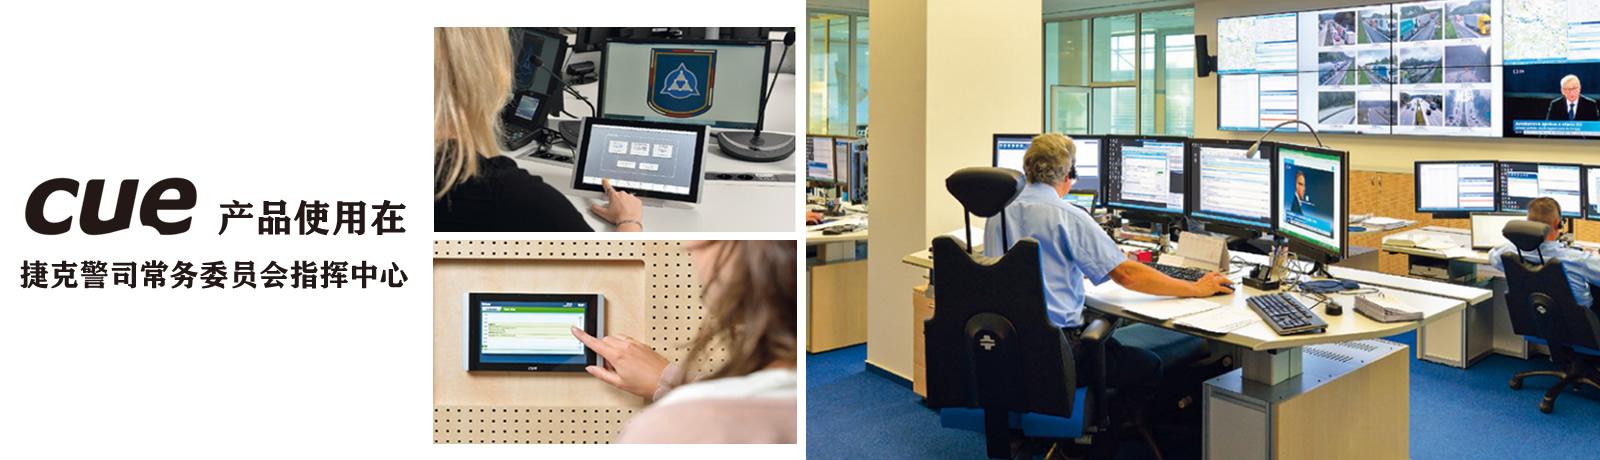 CUE产品应用在捷克警司常务委员会指挥中心